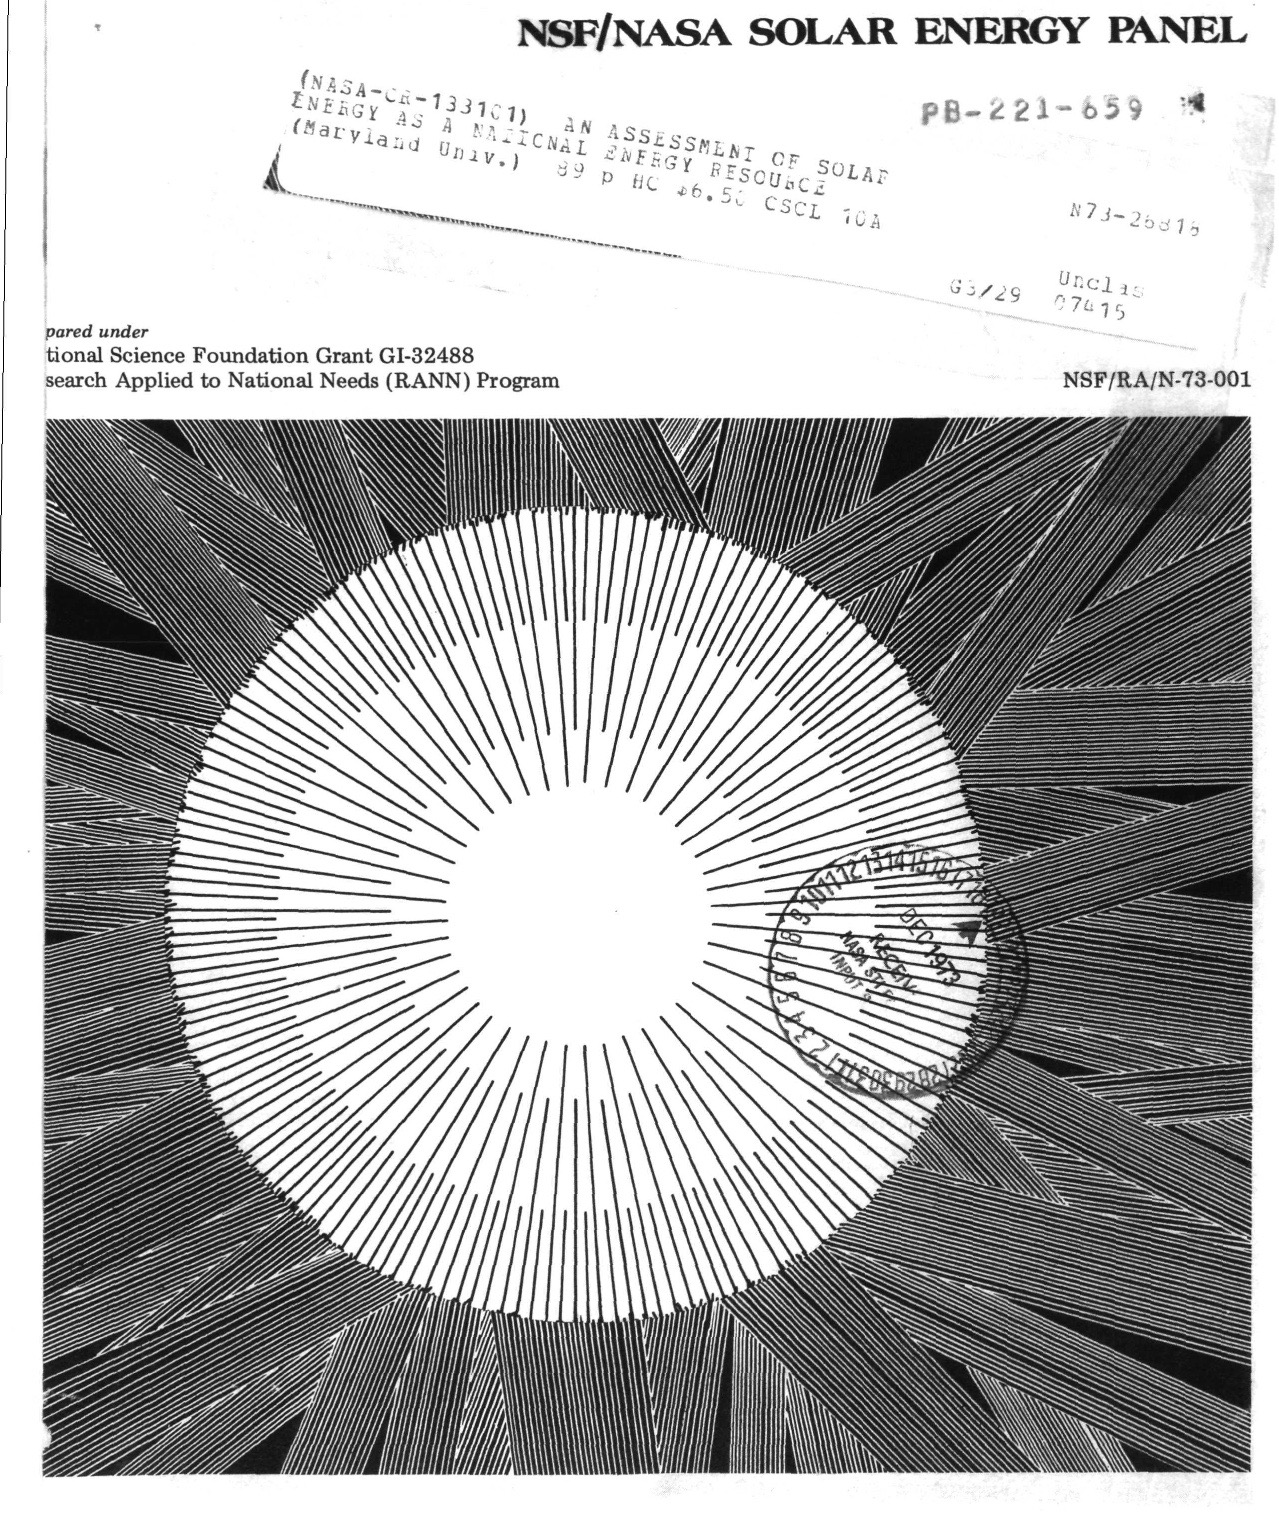 Solar energy 1973 nasa (1).jpg